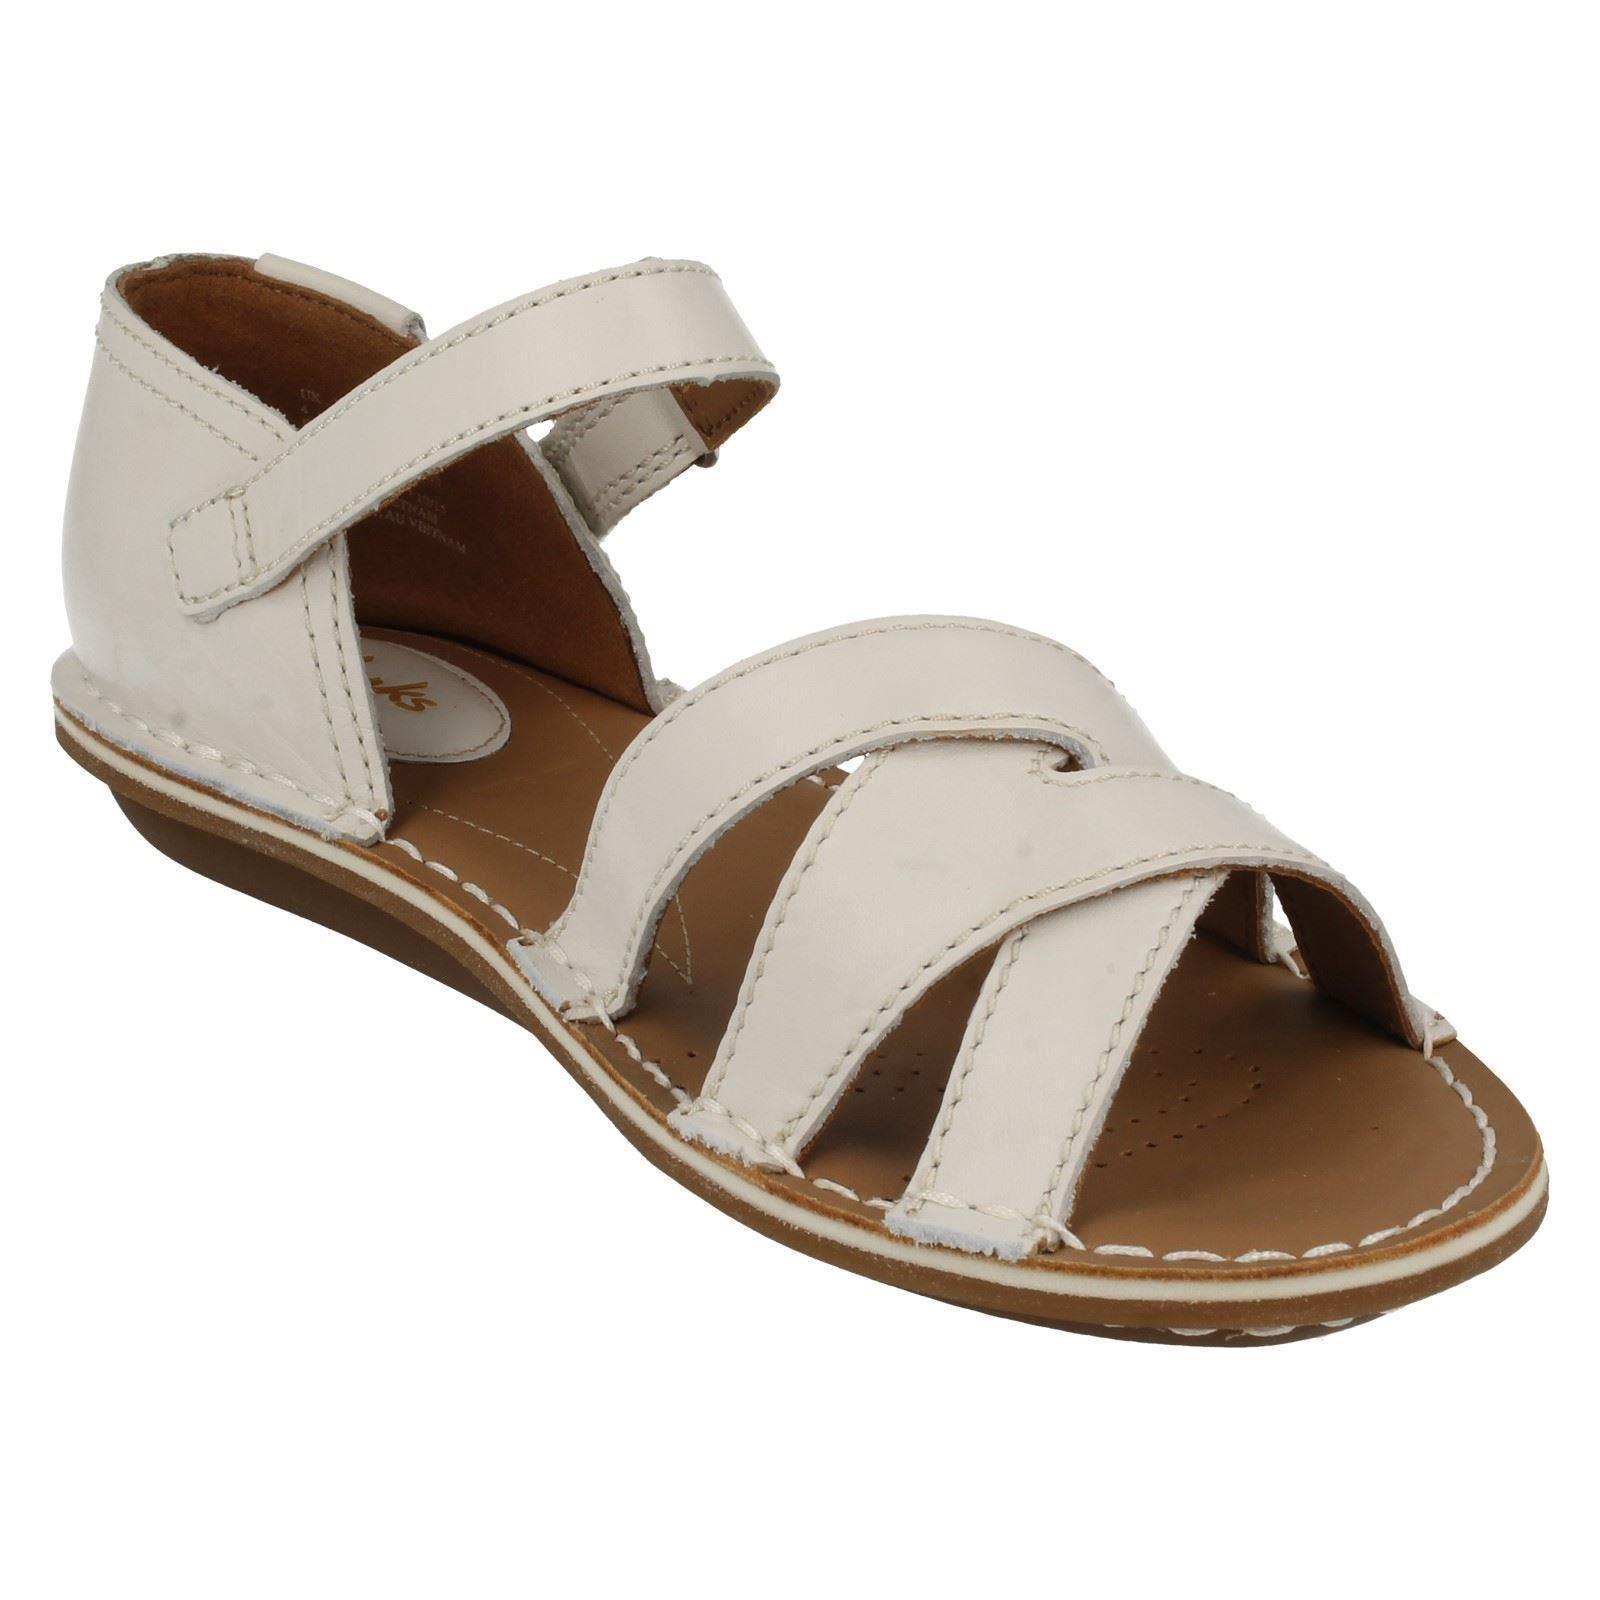 ebac08bc3b58 Ladies Clarks Tustin Sahara Leather Casual Sandals E Fitting UK 4 ...